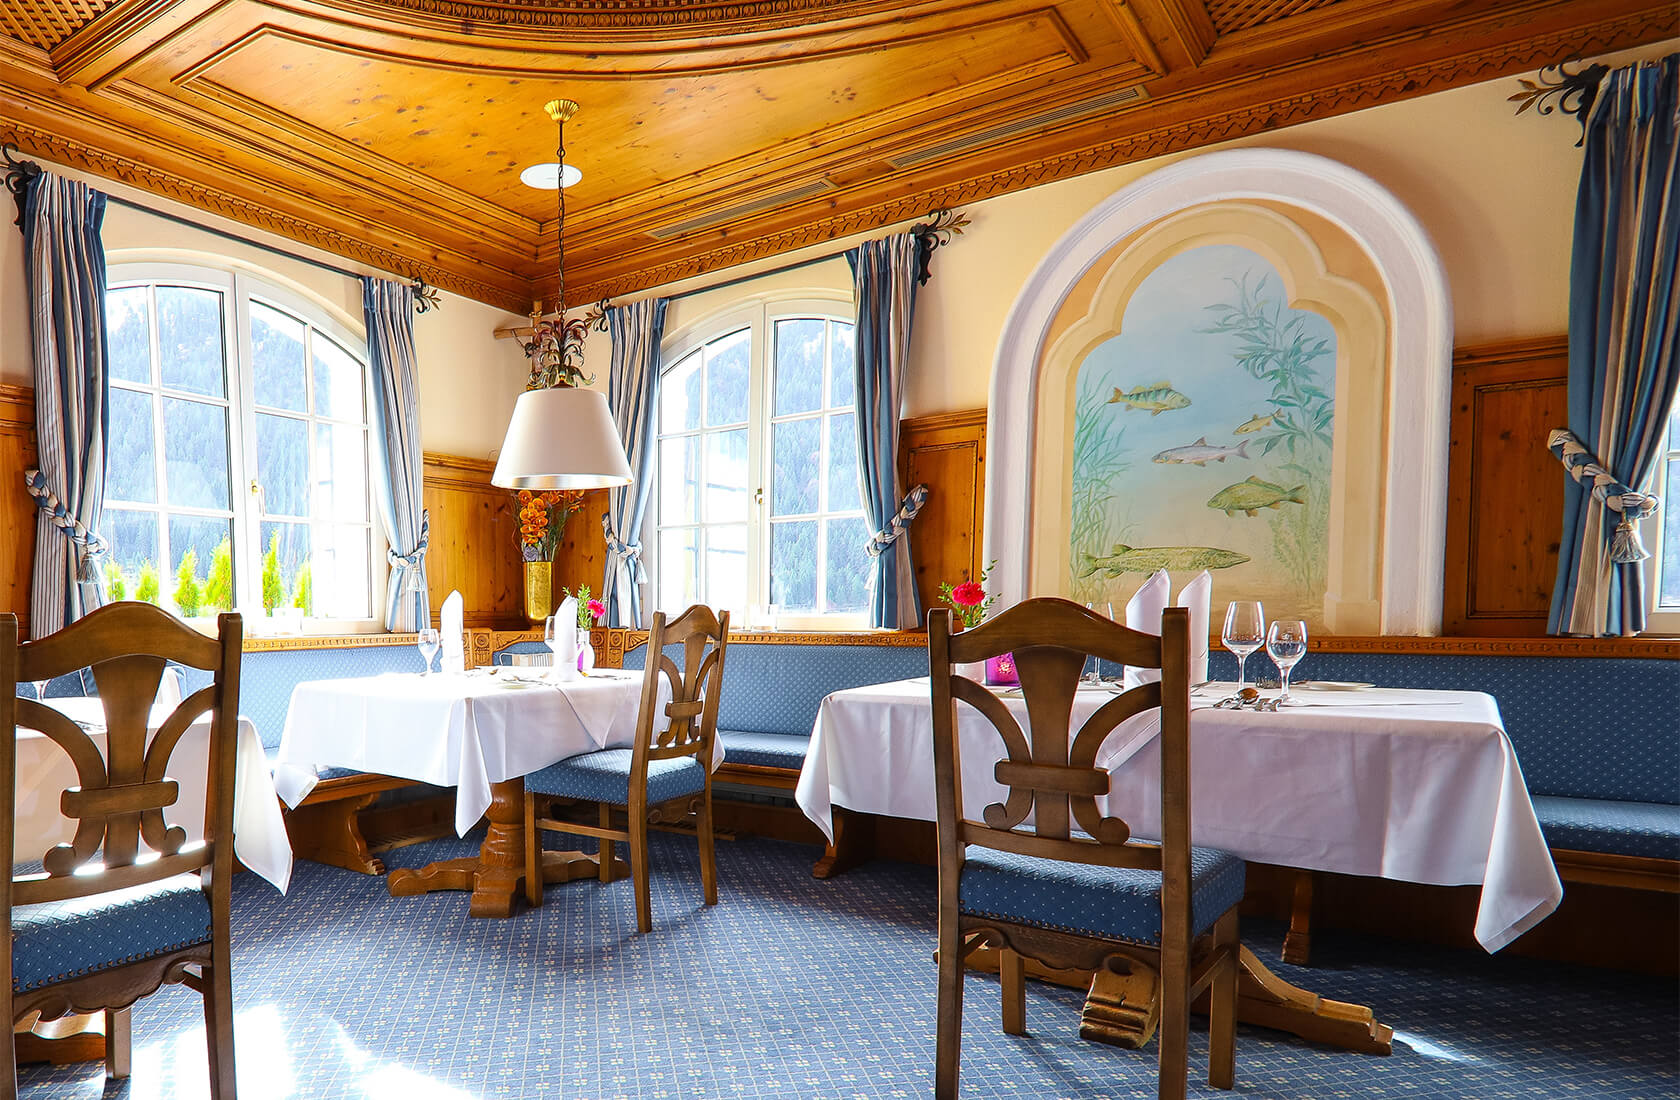 Hotel Via Salina Restaurant Fischerstube im Tannheimer Tal